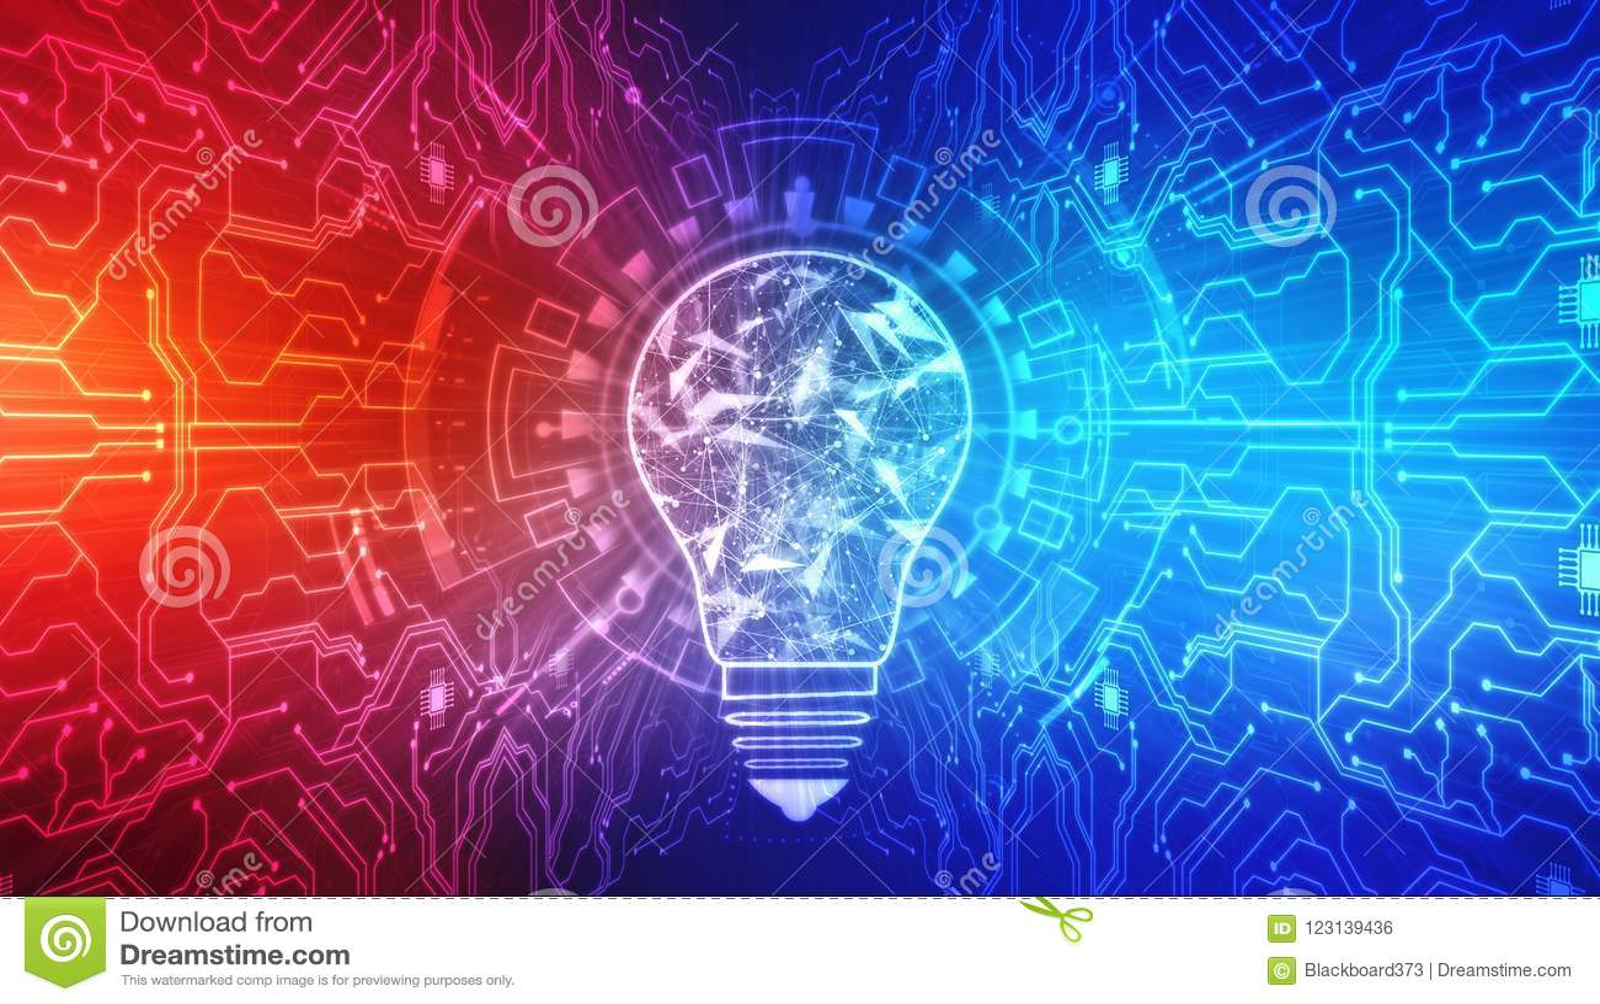 Fondo de la innovación, concepto creativo de la idea, fondo del concepto de la inteligencia artificial